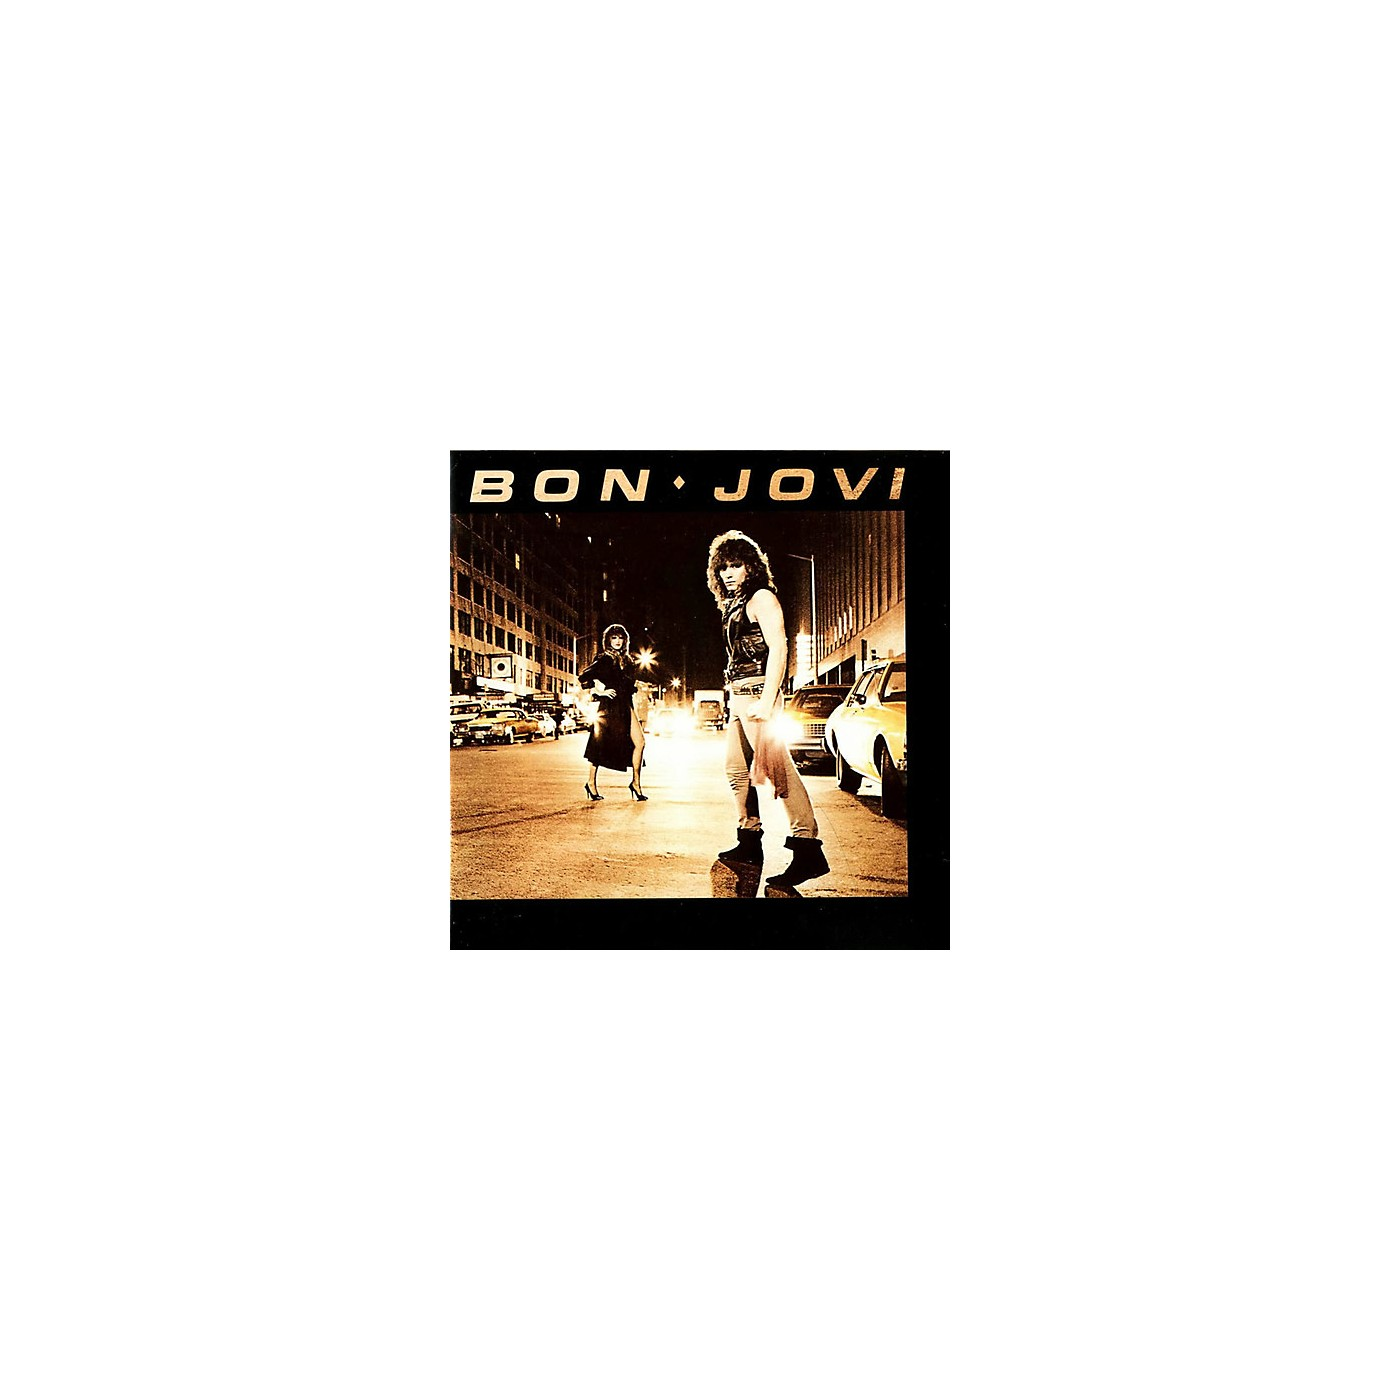 Alliance Bon Jovi - Bon Jovi thumbnail